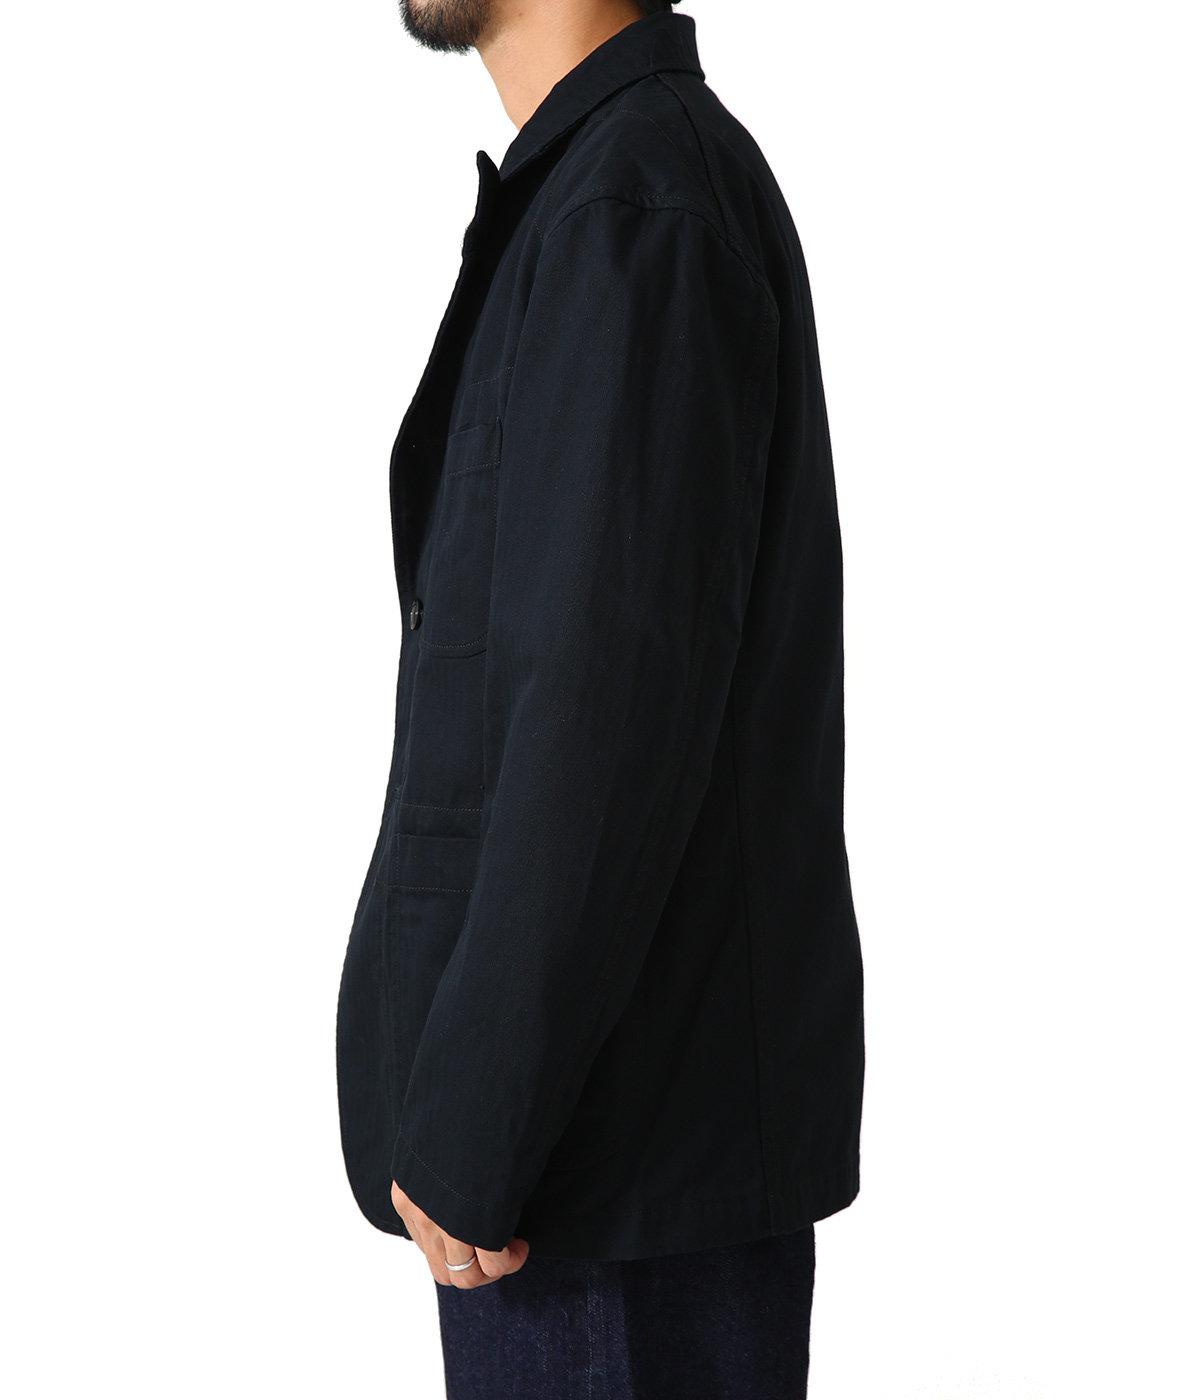 Bedford Jacket - HB Twill